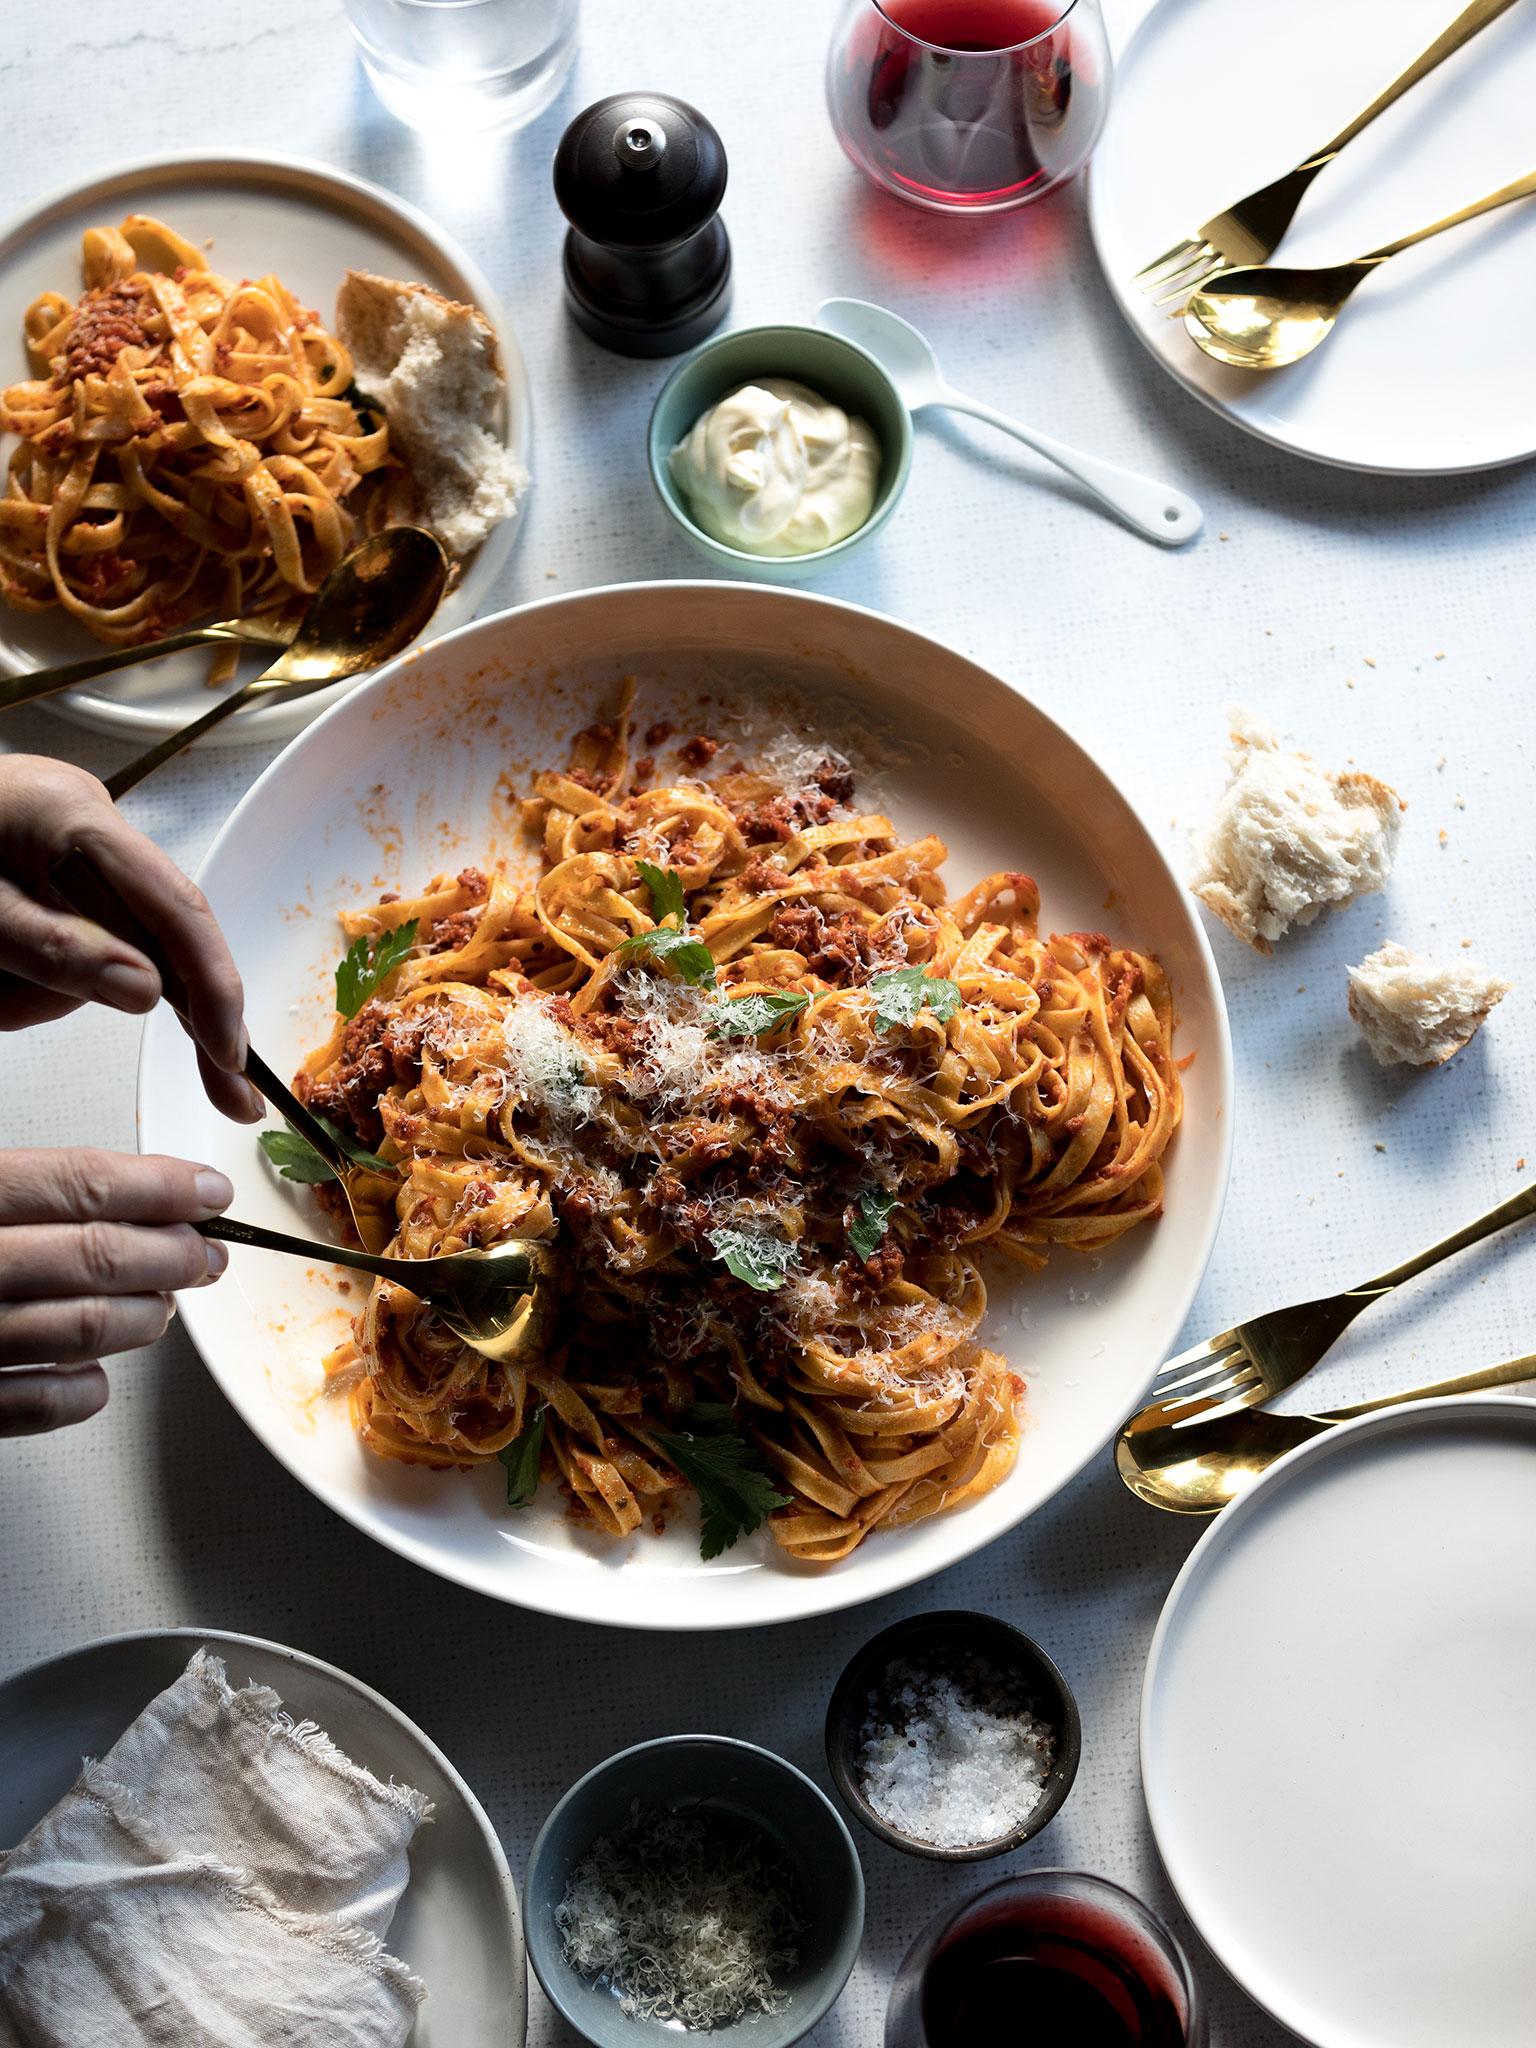 2-148-Chorizo-and-Arrabbiata-Pasta-web.jpg